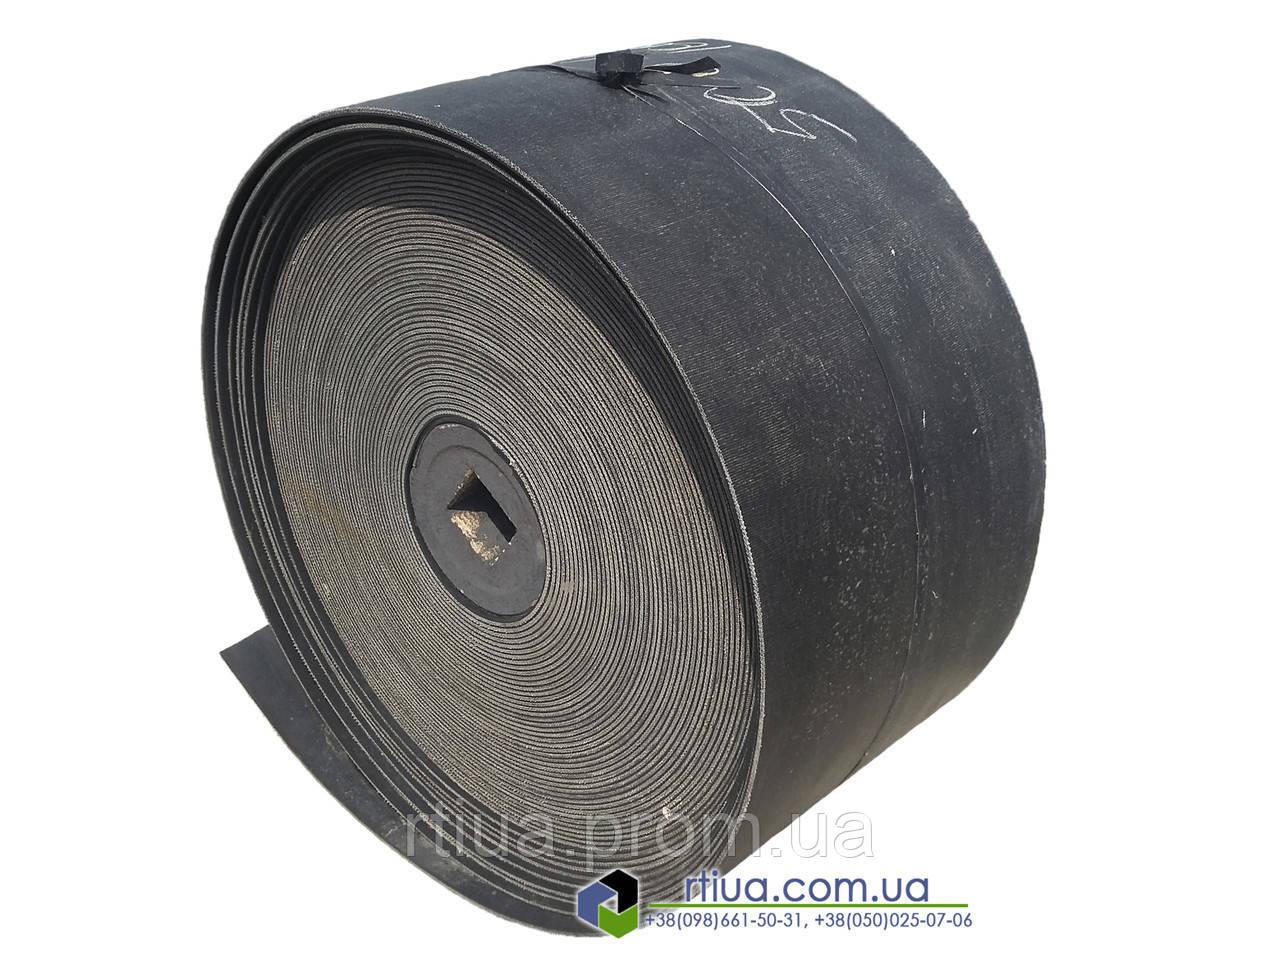 Конвейерная лента 125х5 мм